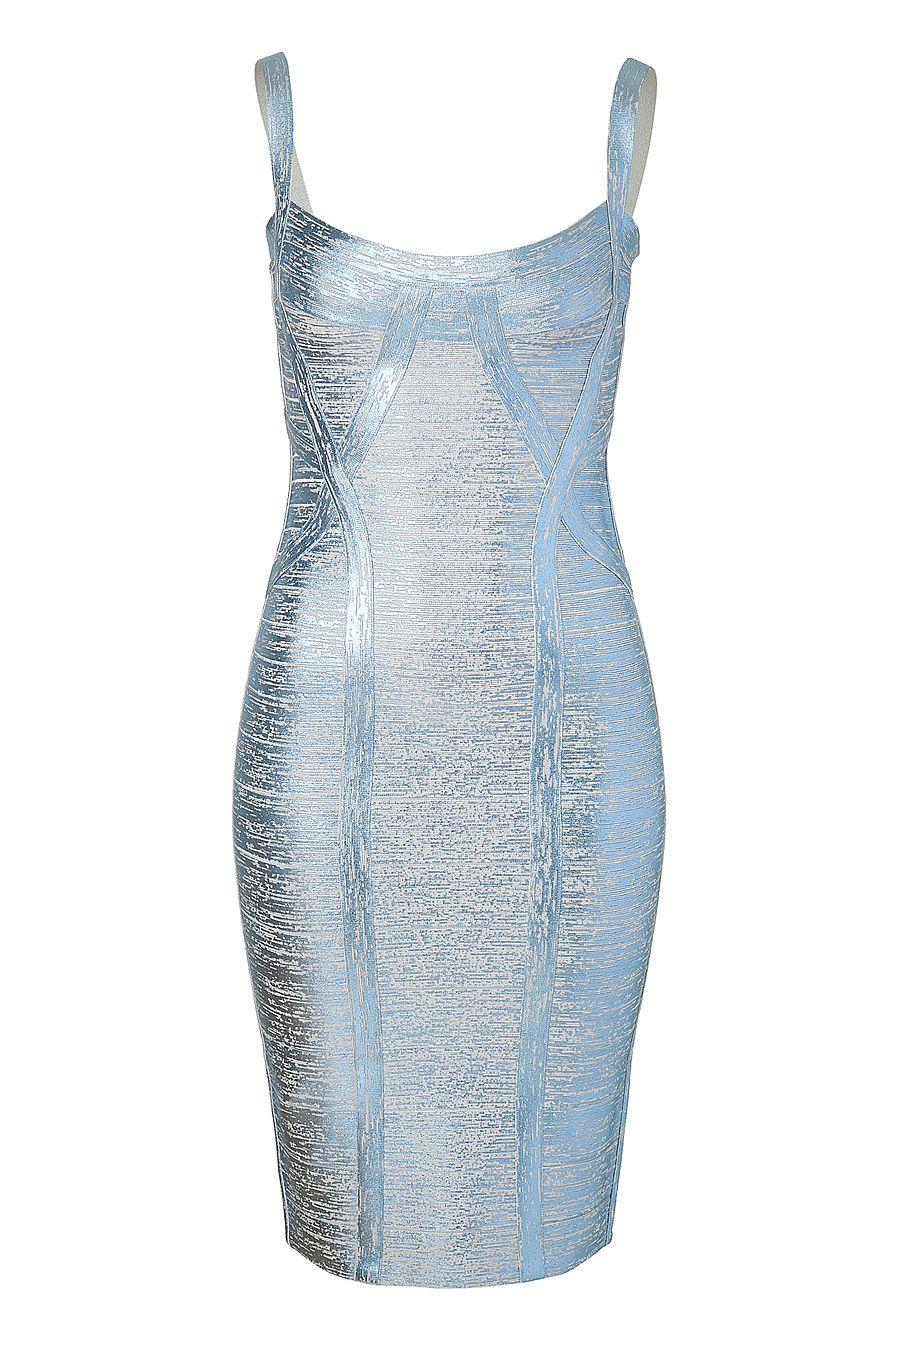 HERVE LEGER  bandage dress in Ice Grey Metallic  was € 1689 - is  € 1013    (- 40%)